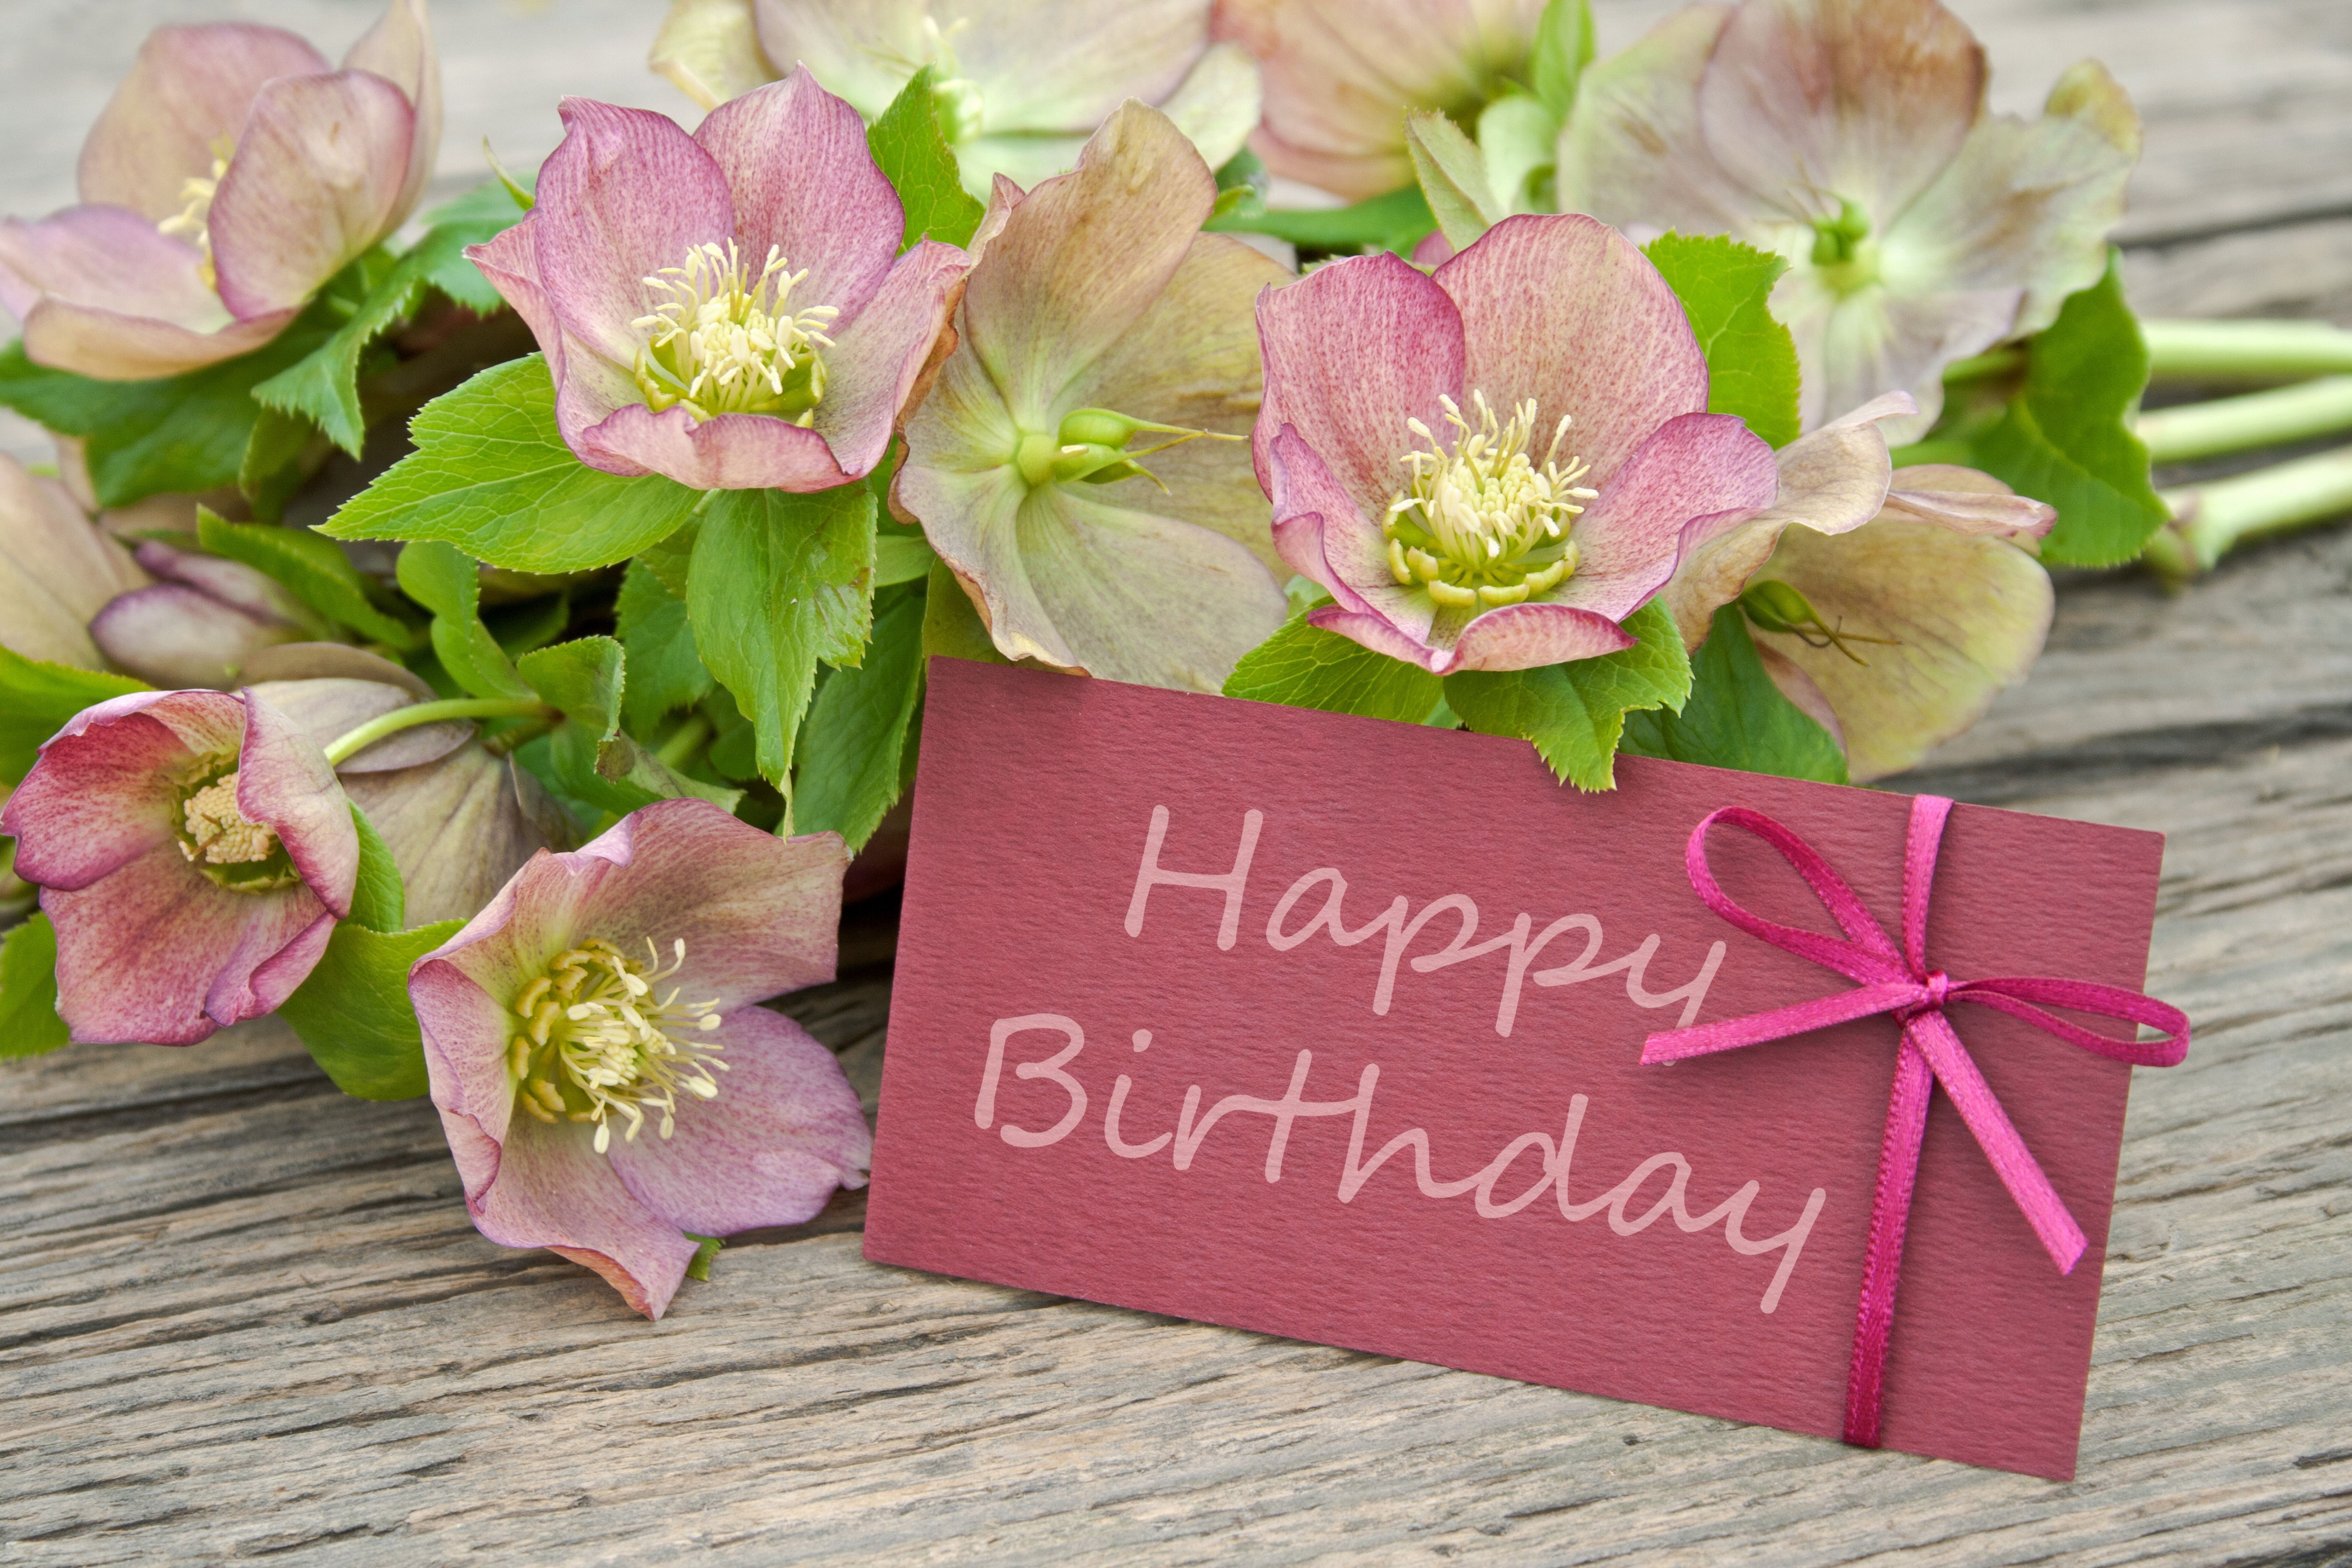 Happy Birthday Pics With Flowers Birthday Pinterest